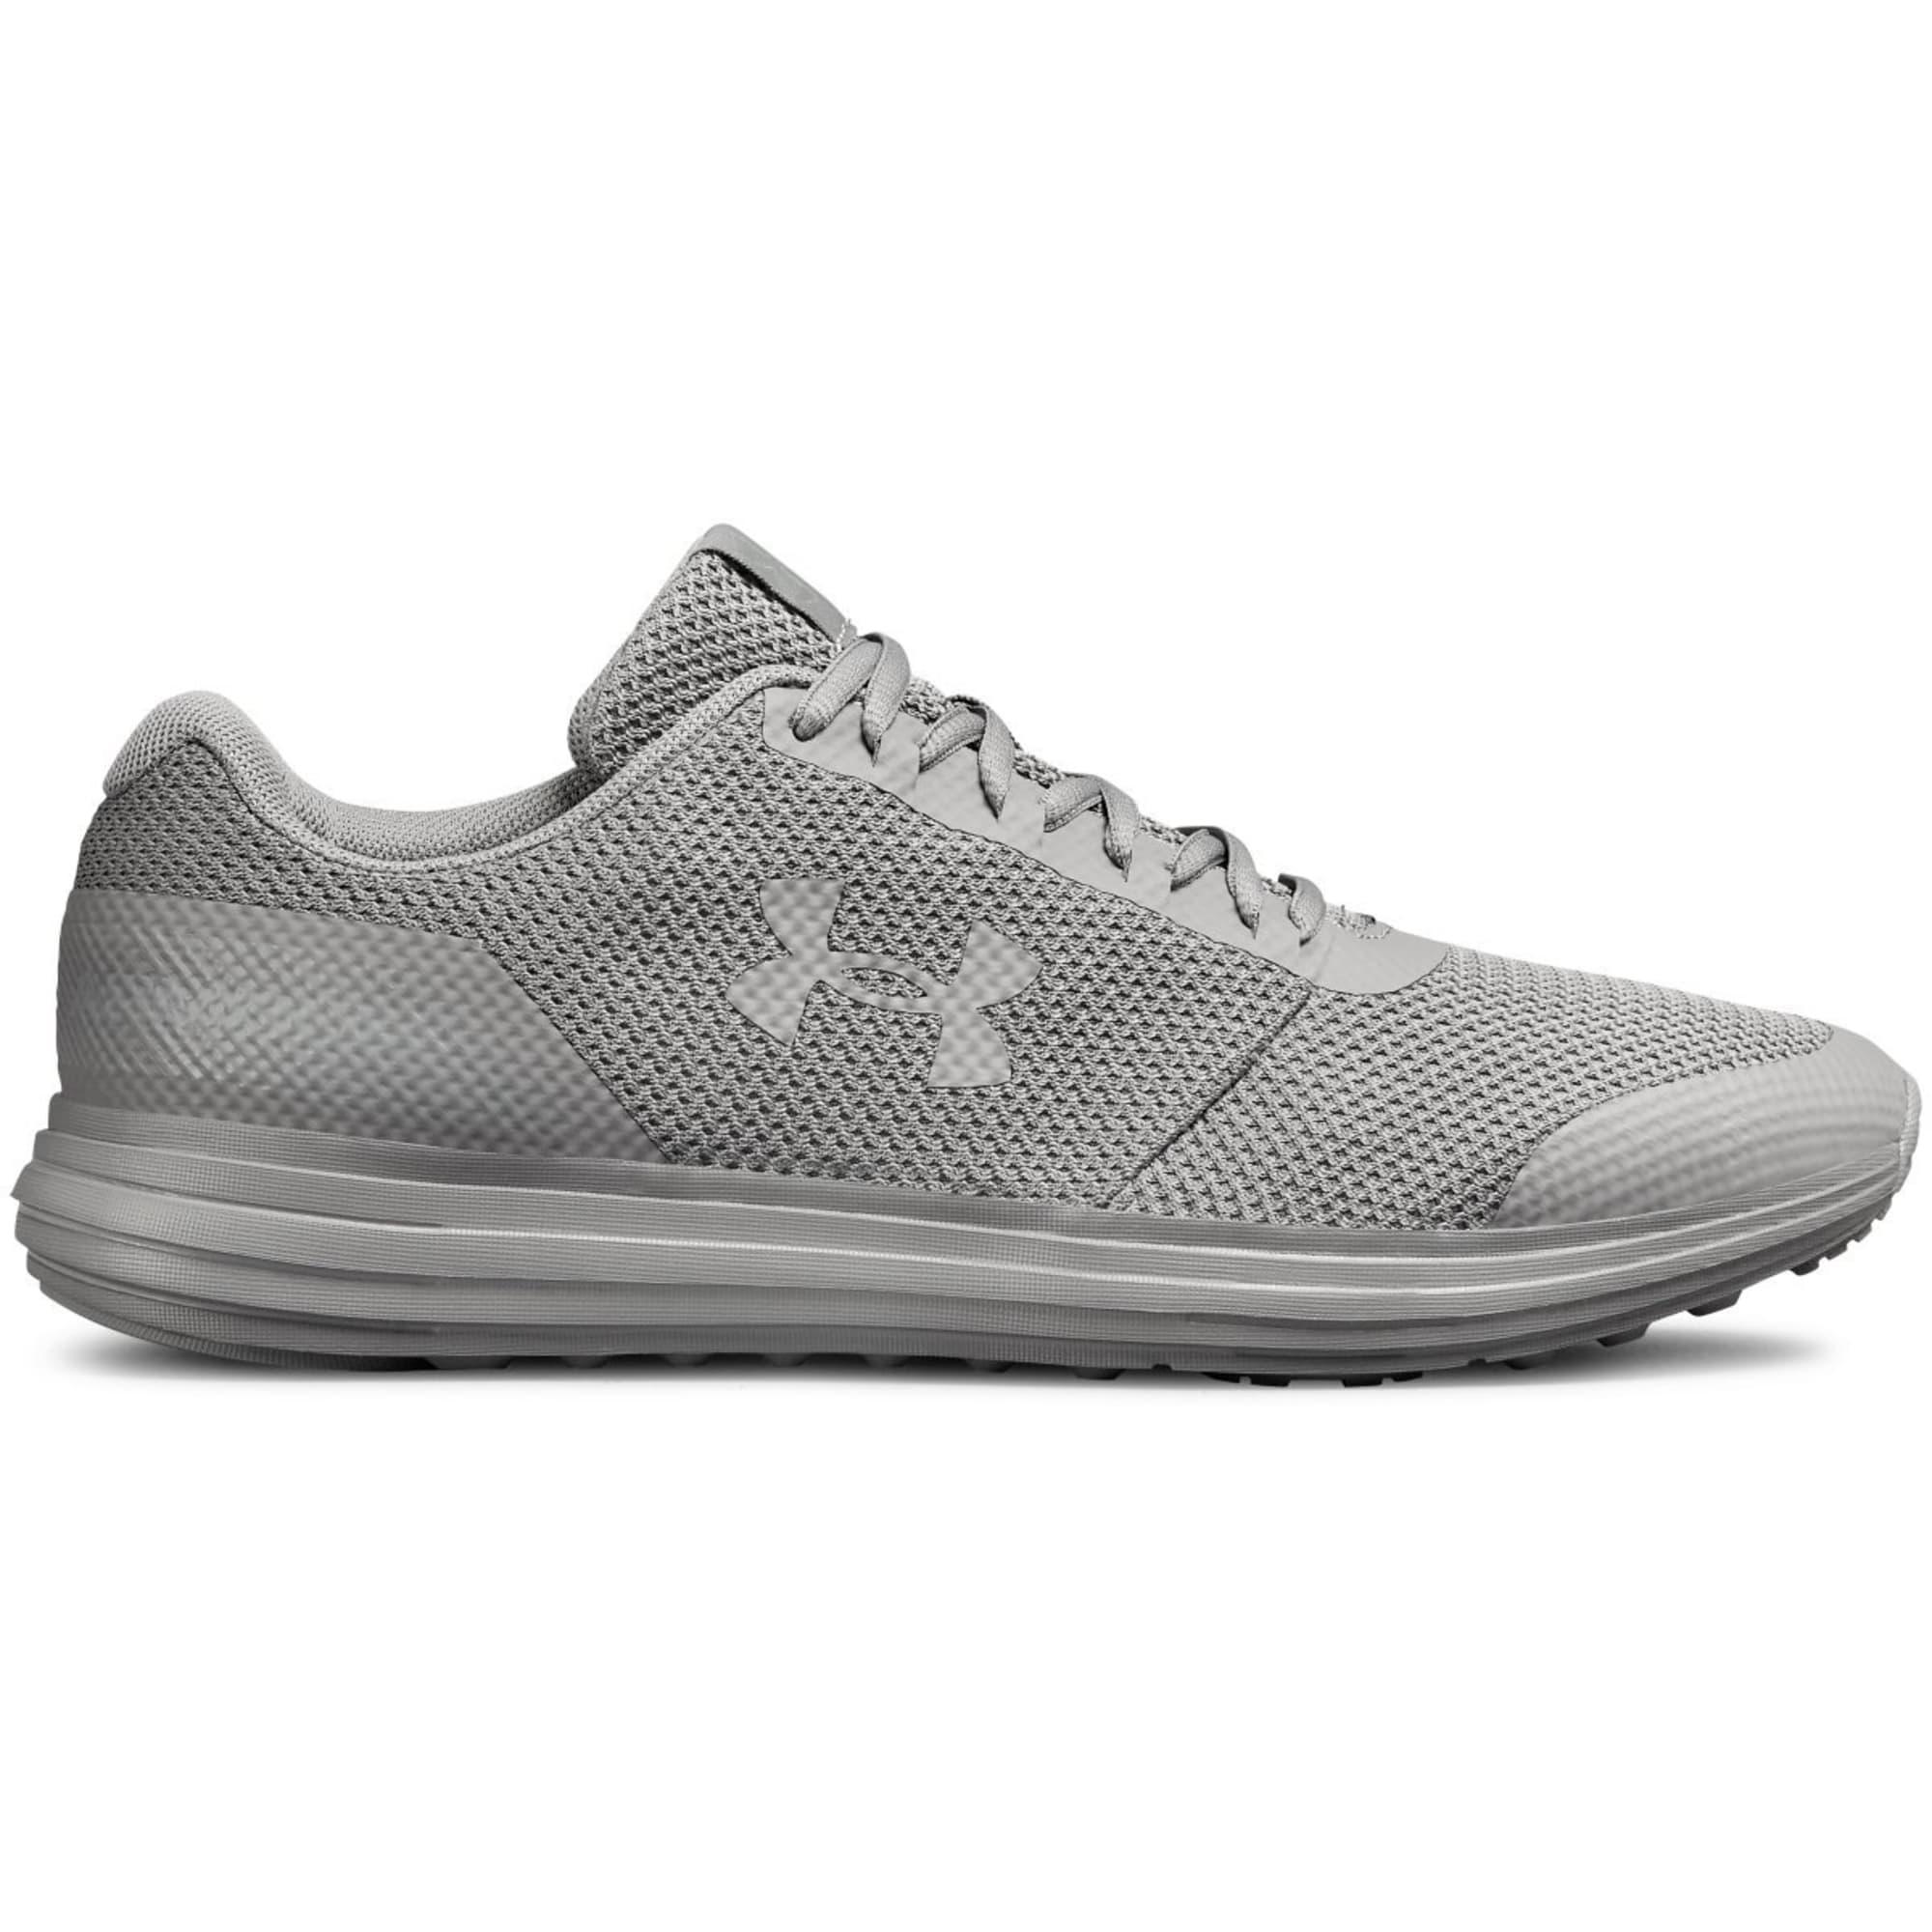 Simular Planta de semillero vestir  UNDER ARMOUR Men's UA Surge Running Shoes - Bob's Stores